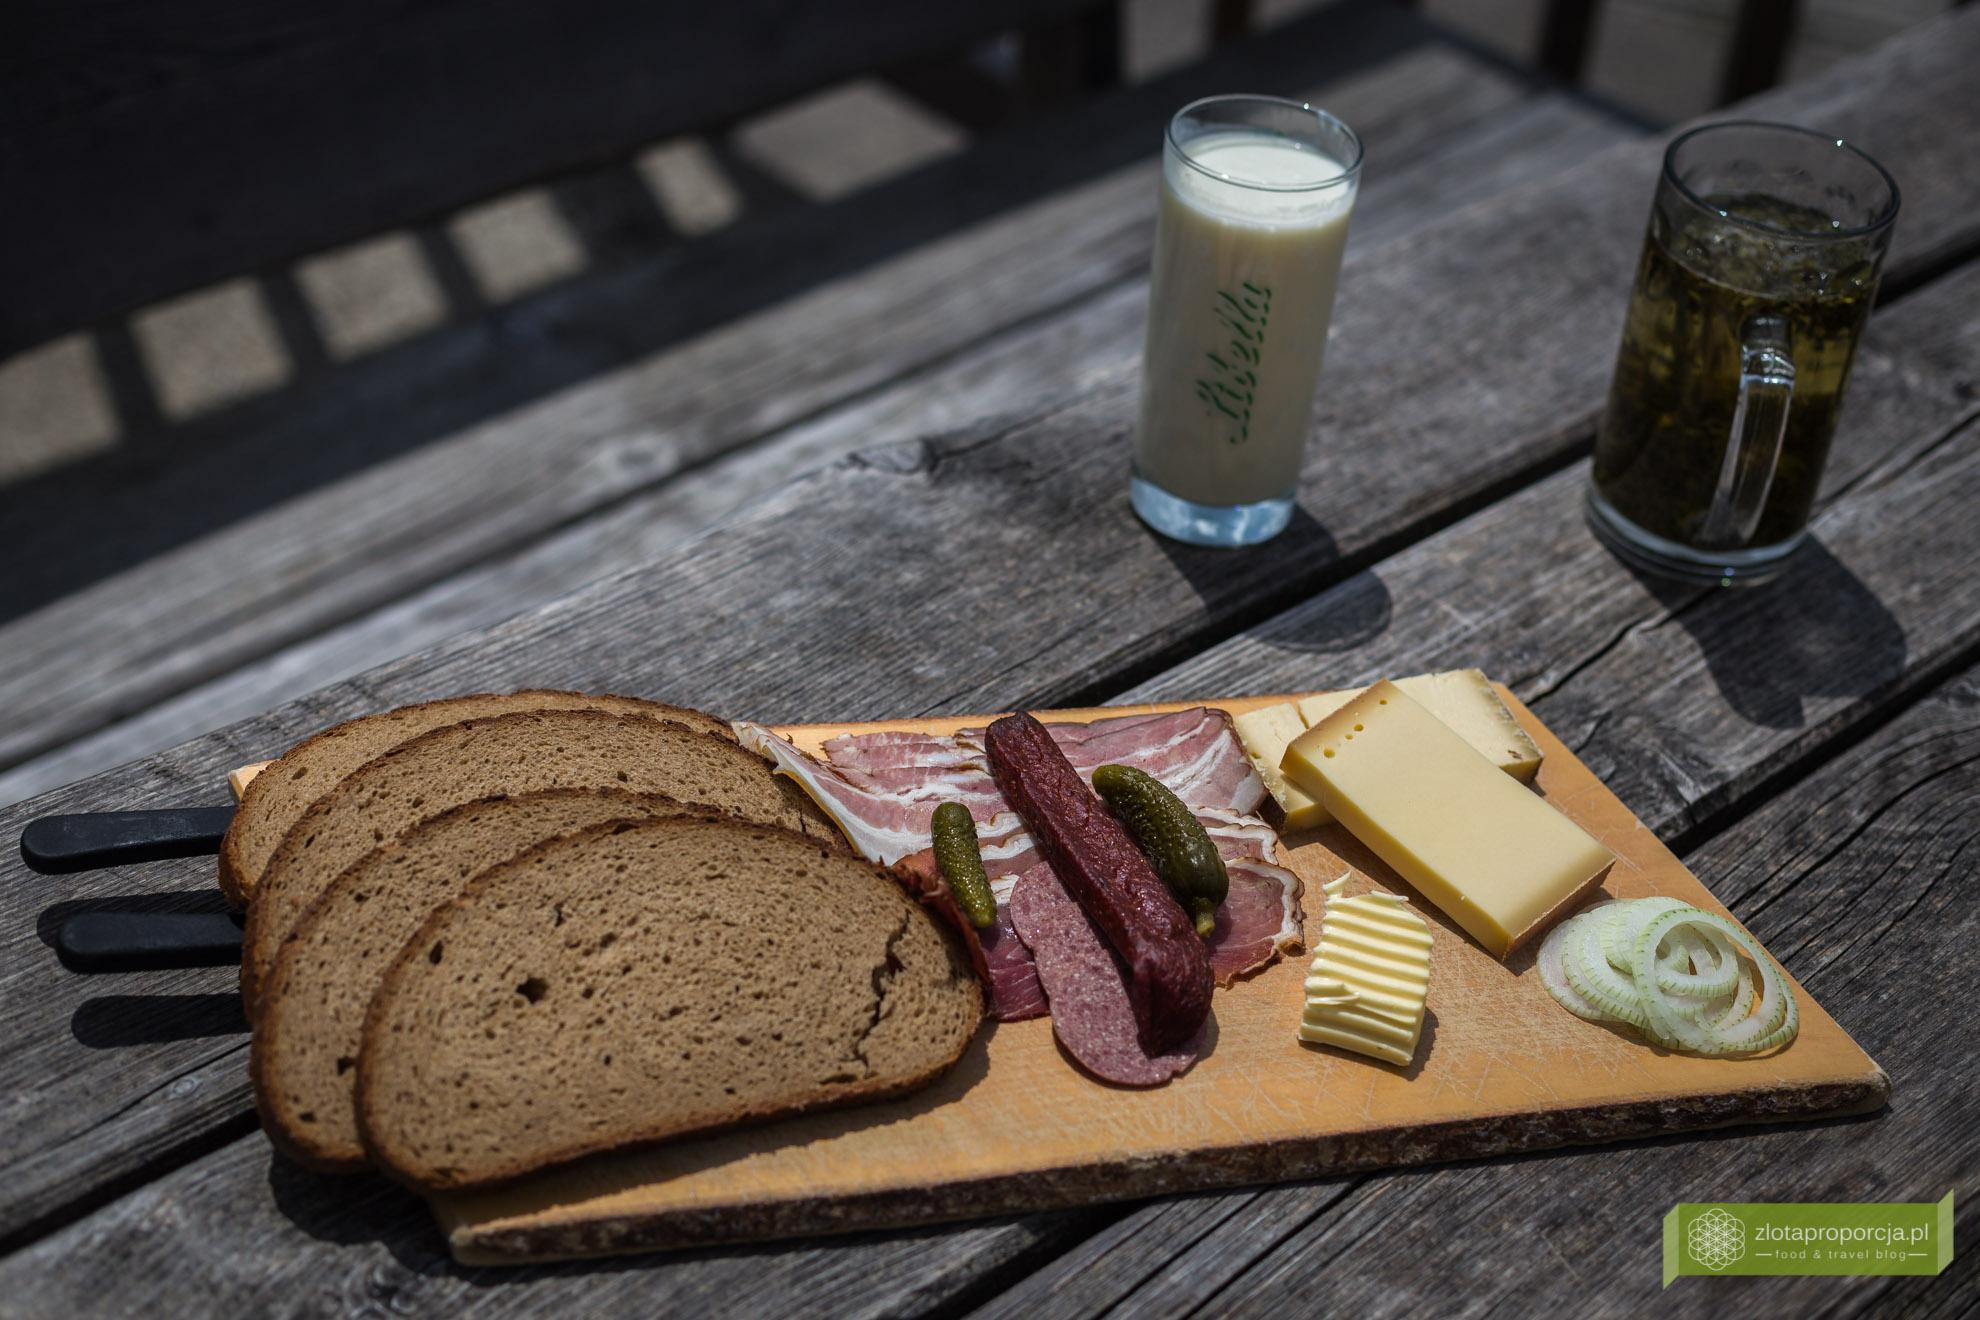 kuchnia bawarska, kuchnia Bawarii, bawarskie potrawy, Bawaria, kuchnia regionu Allgäu